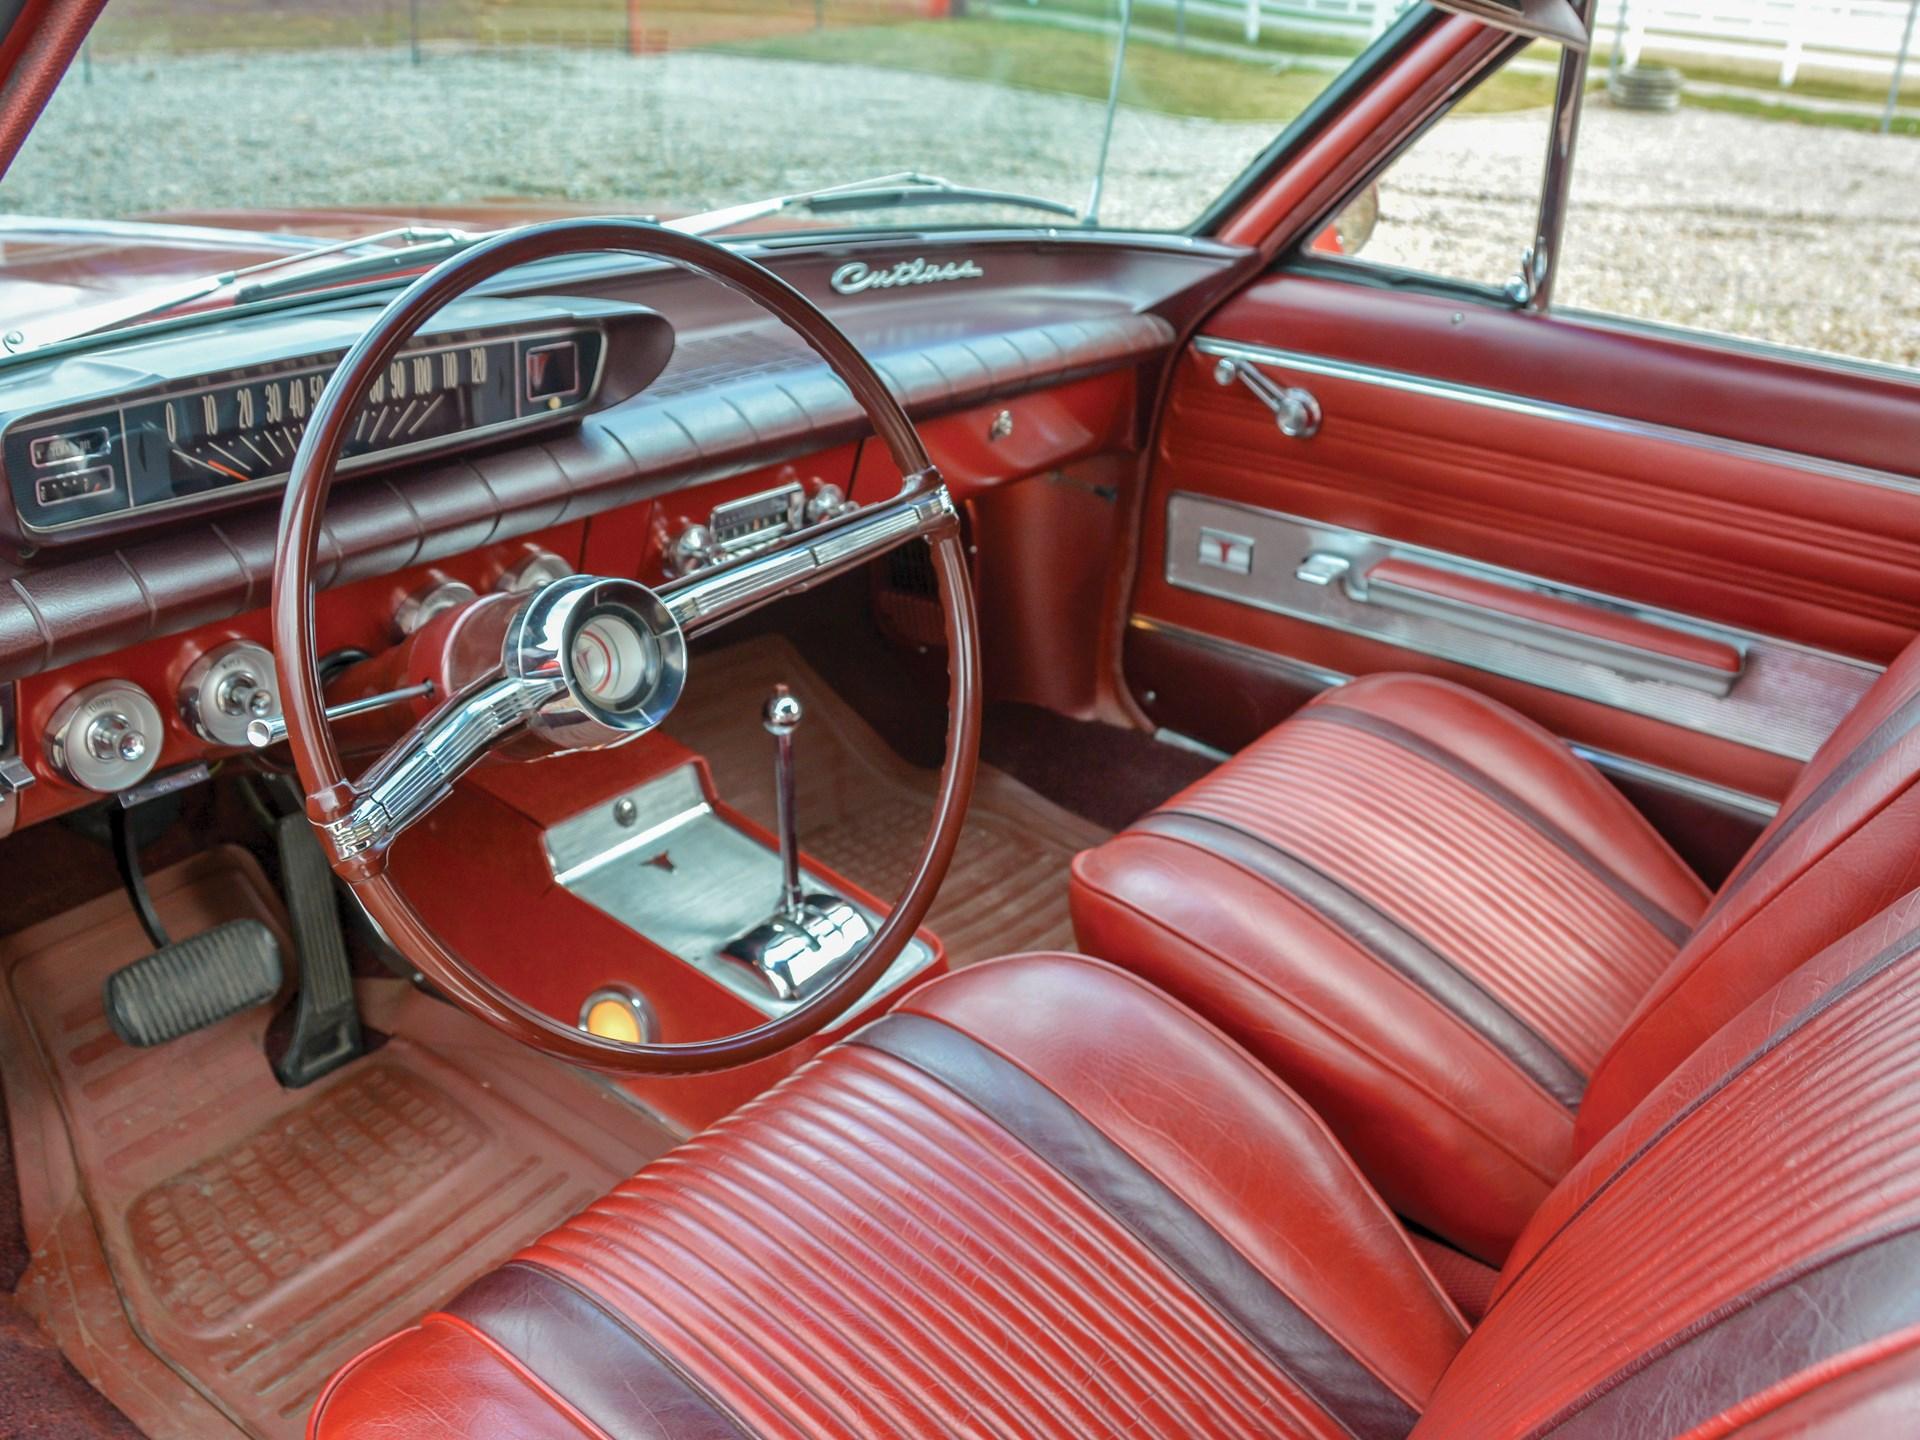 RM Sotheby's - 1962 Oldsmobile F-85 Cutlass Convertible